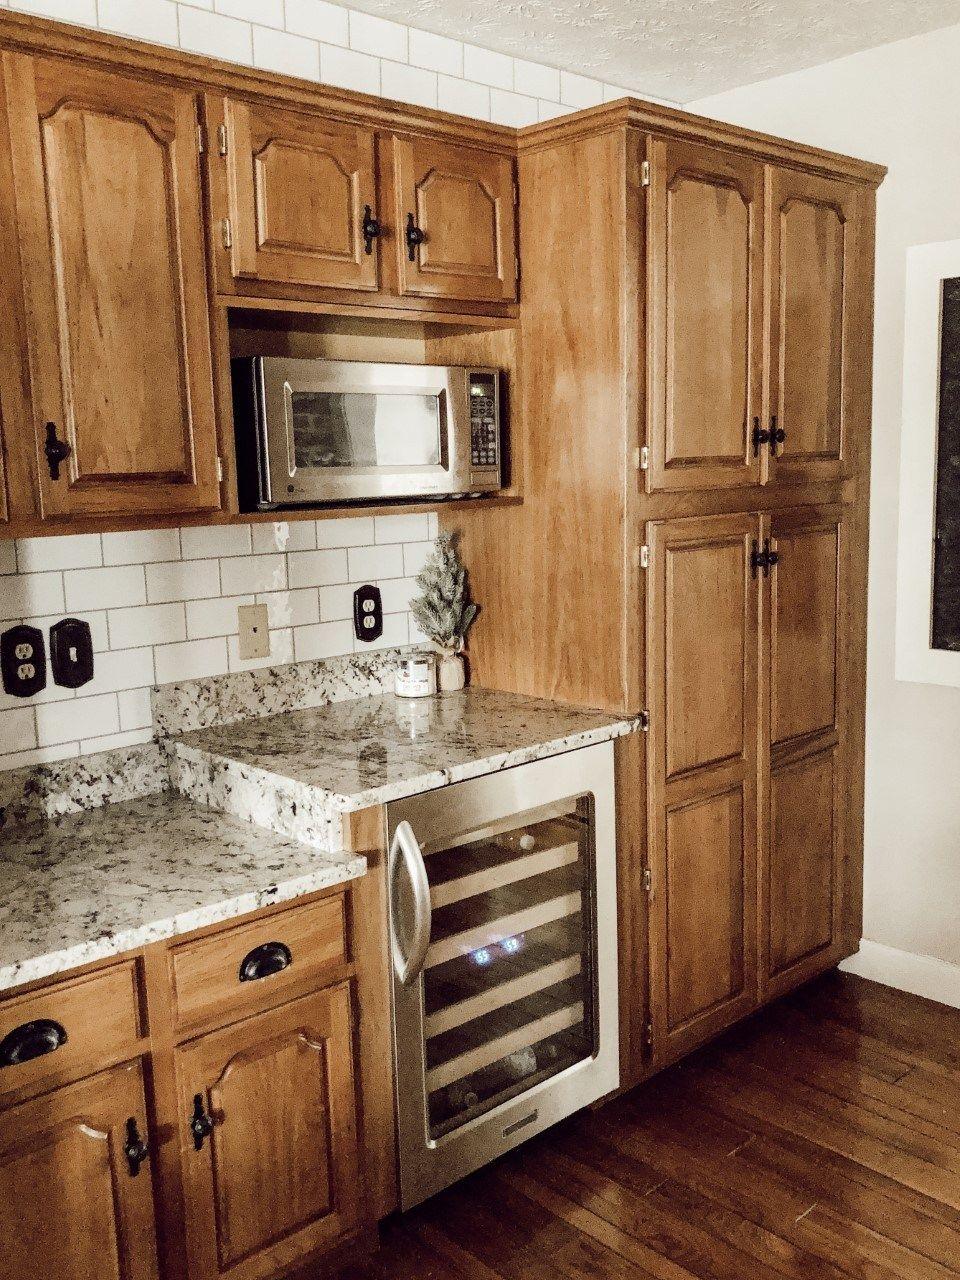 Backsplash on a Budget   Backsplash, Home decor, Budgeting